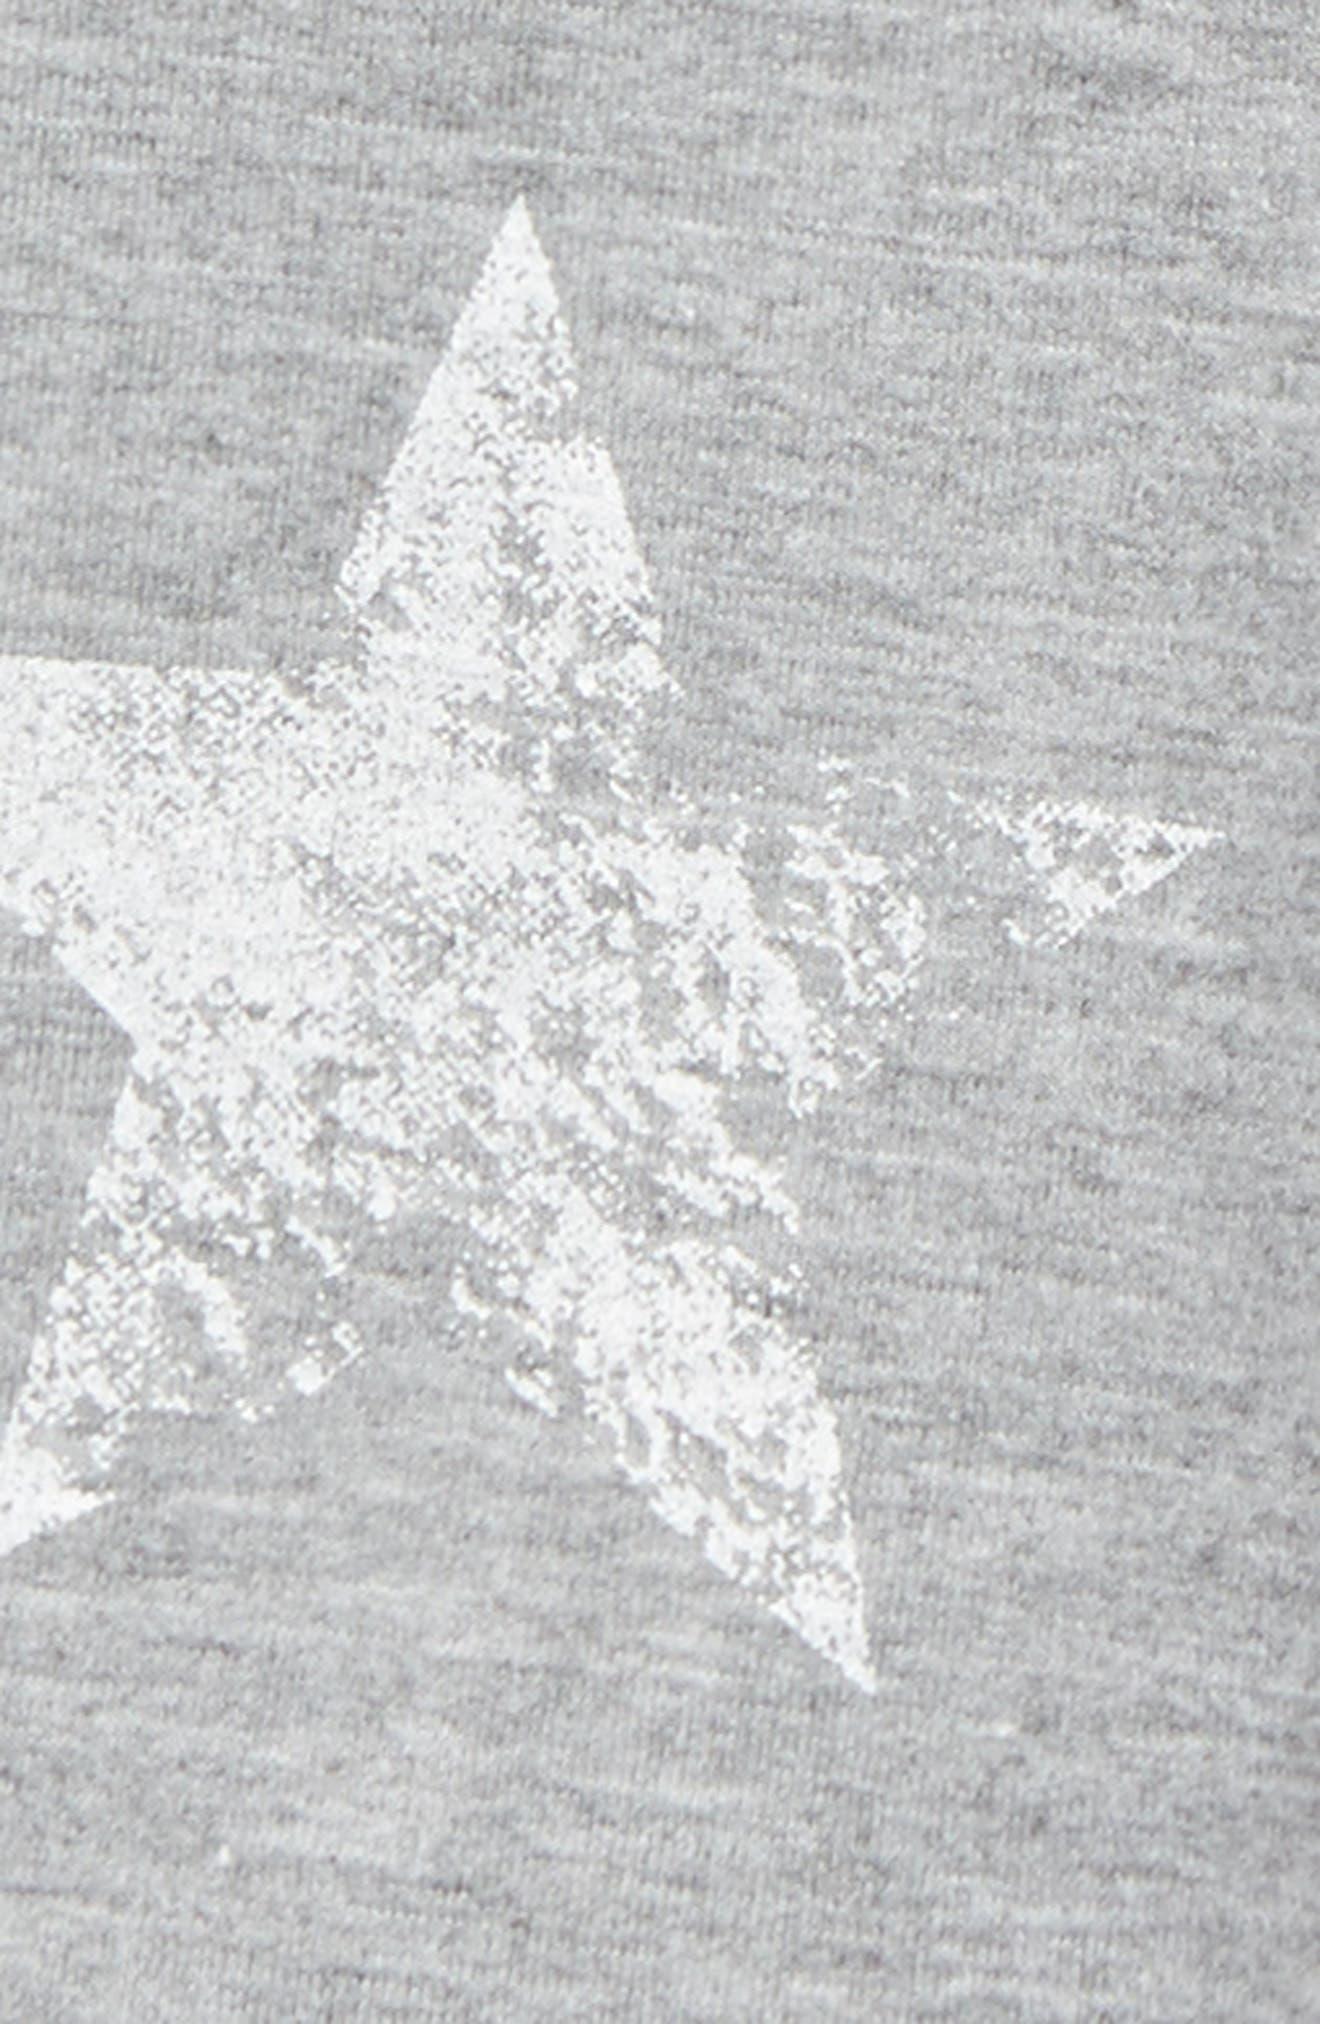 Star Print Knit Shorts,                             Alternate thumbnail 2, color,                             Grey Mgrwst Stars Mgrwst